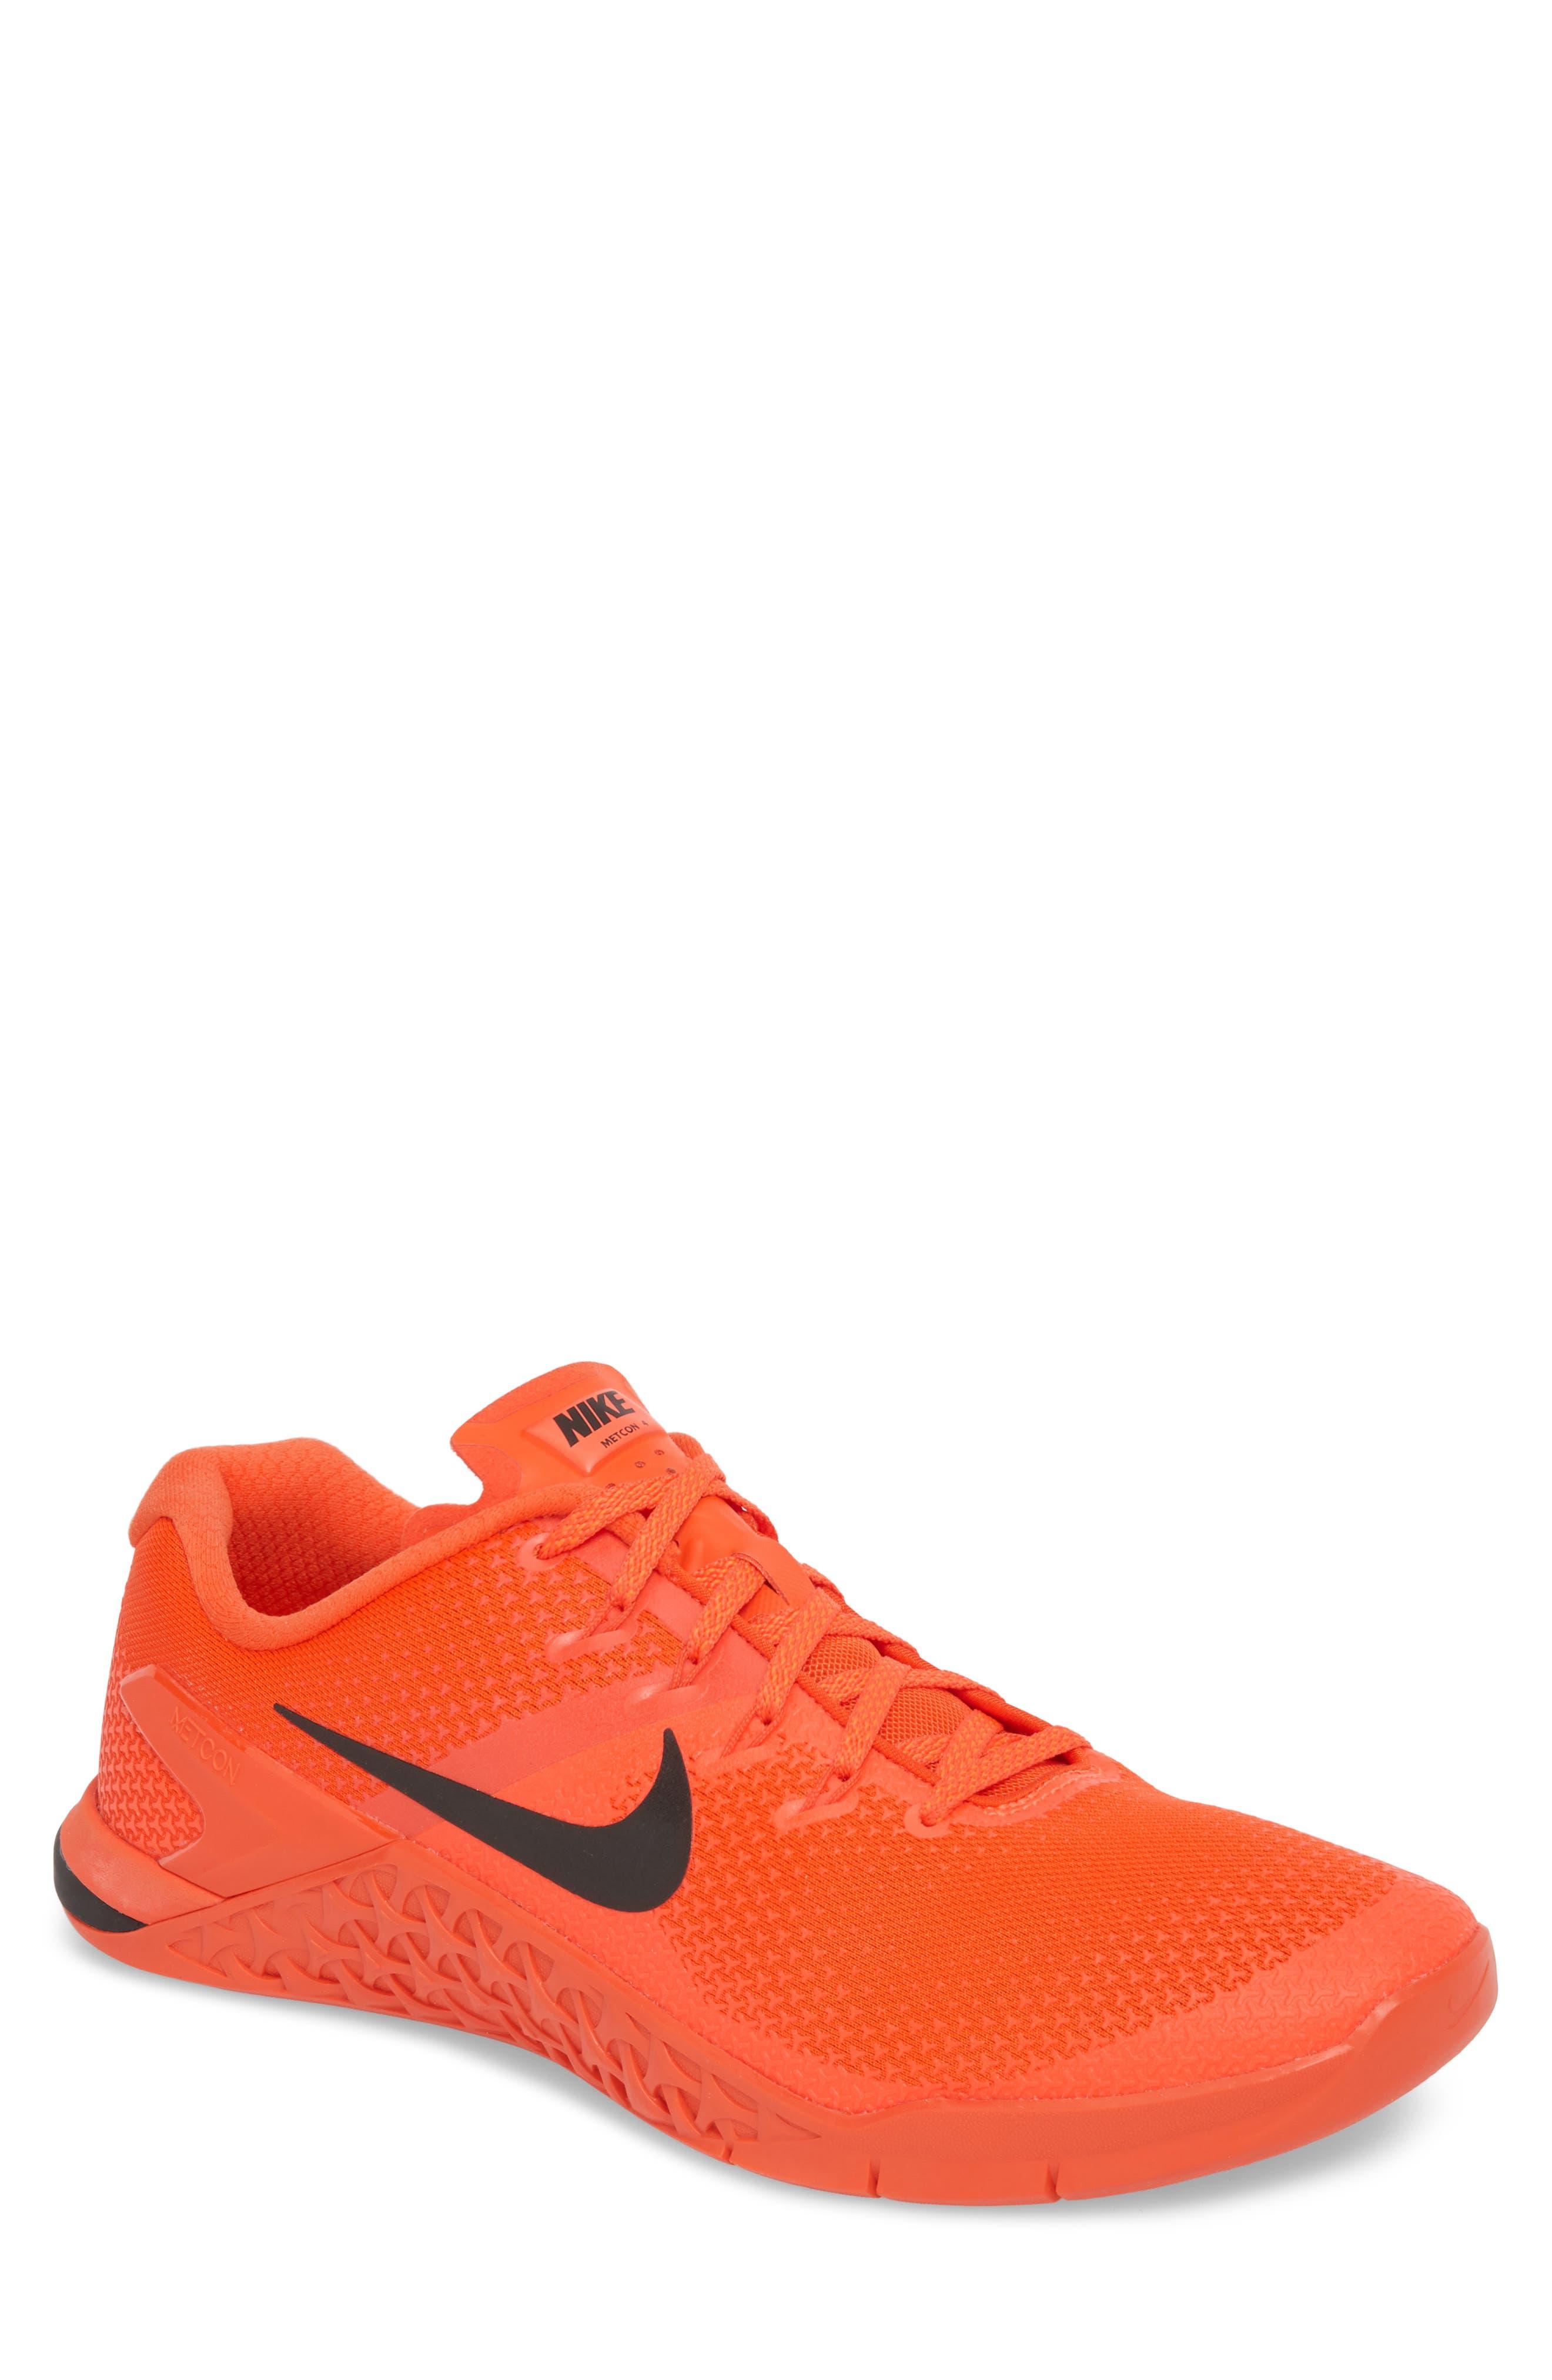 Metcon 4 Training Shoe,                             Main thumbnail 18, color,